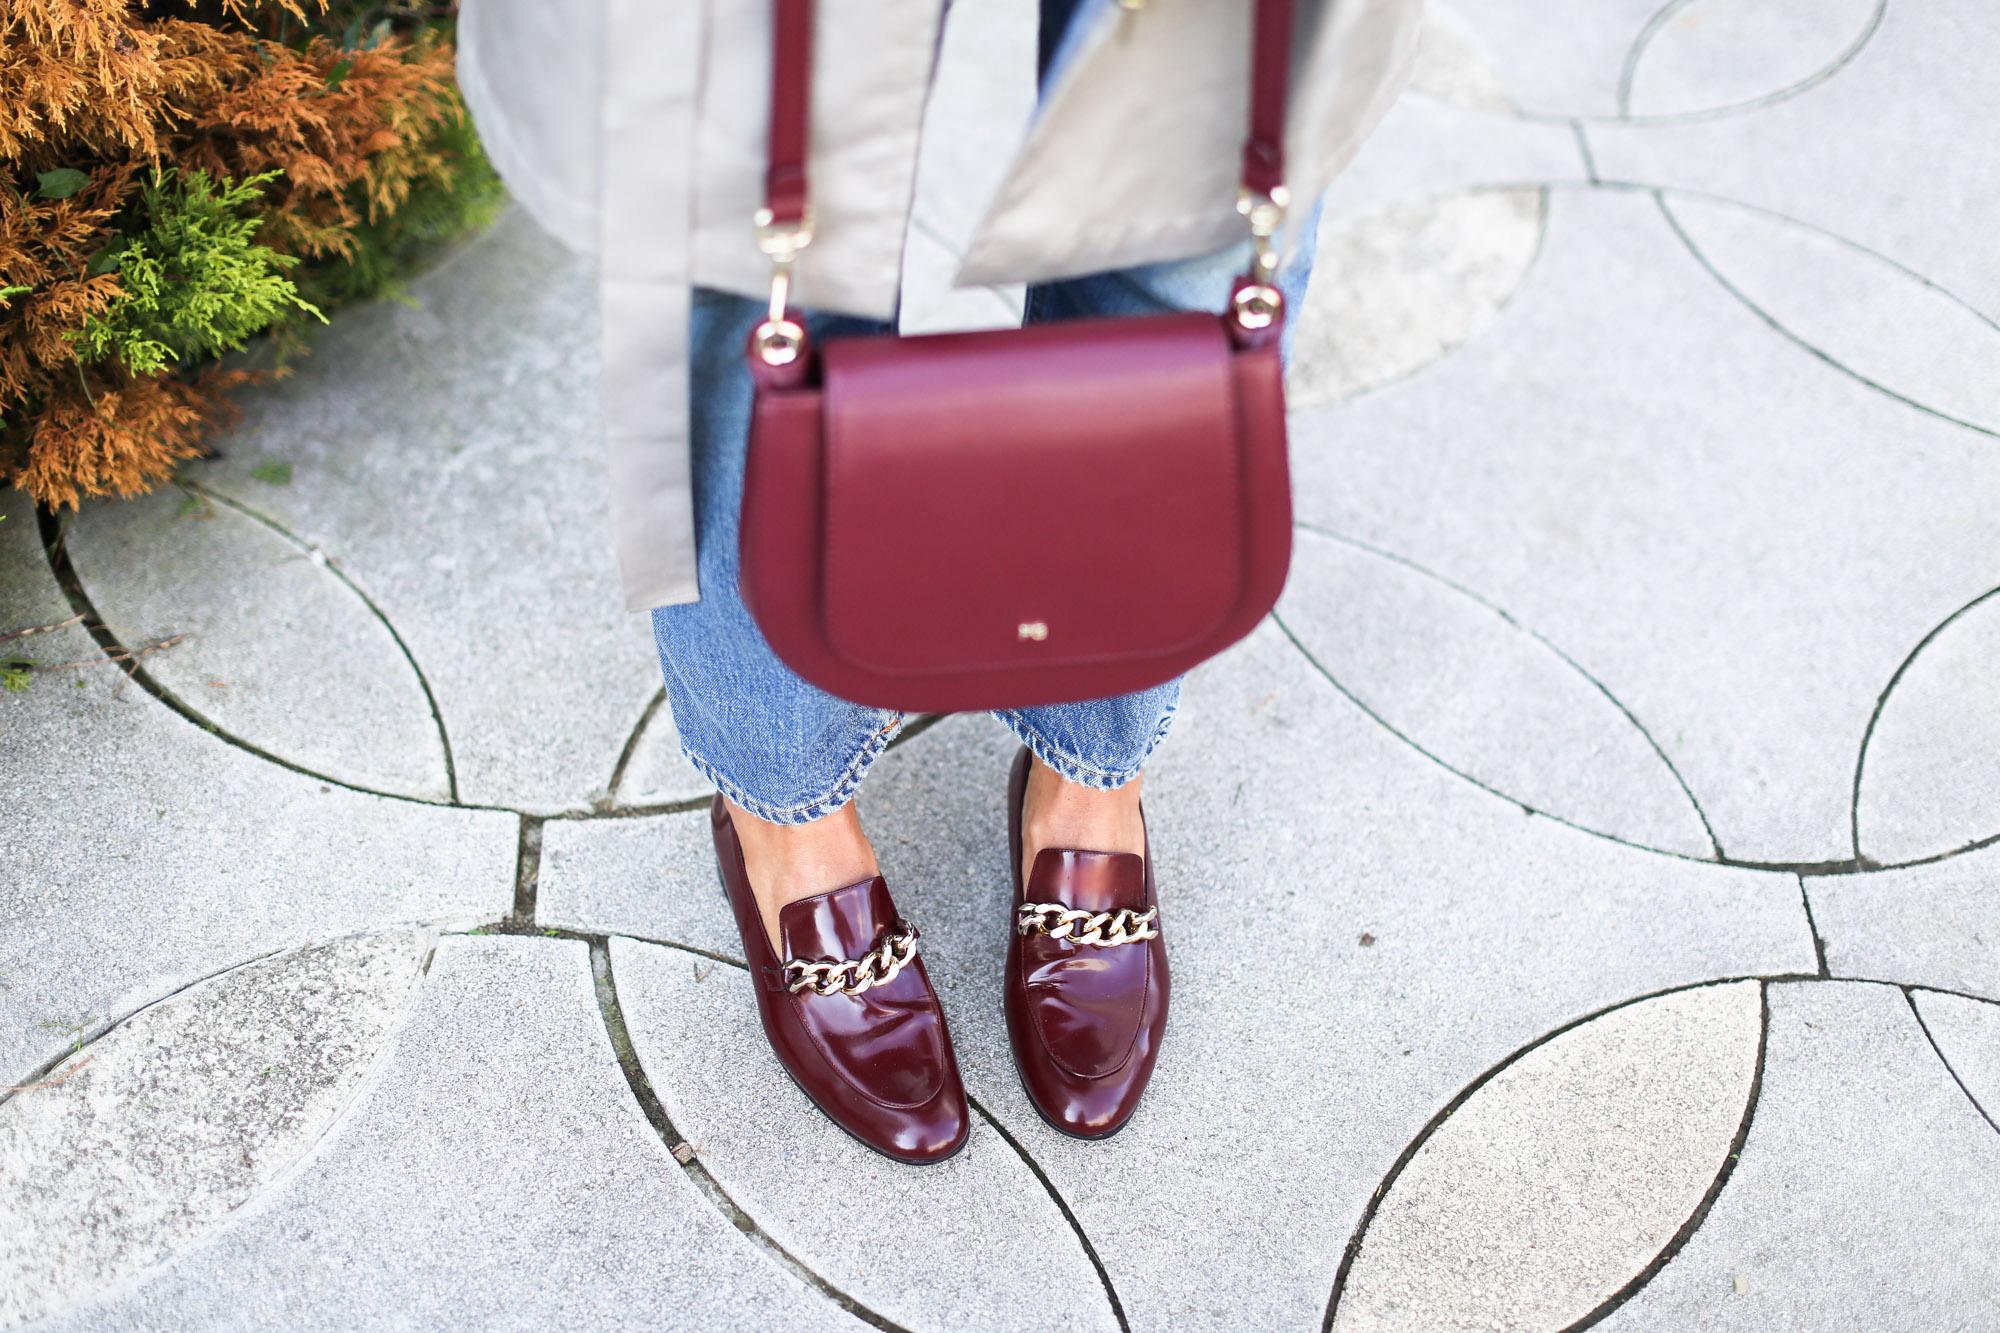 Clochet_streetstyle_fashionblogger_purificaciongarcia_pgbacktothecity_bandolerapielwestfalia_mocasinespielgranates-6